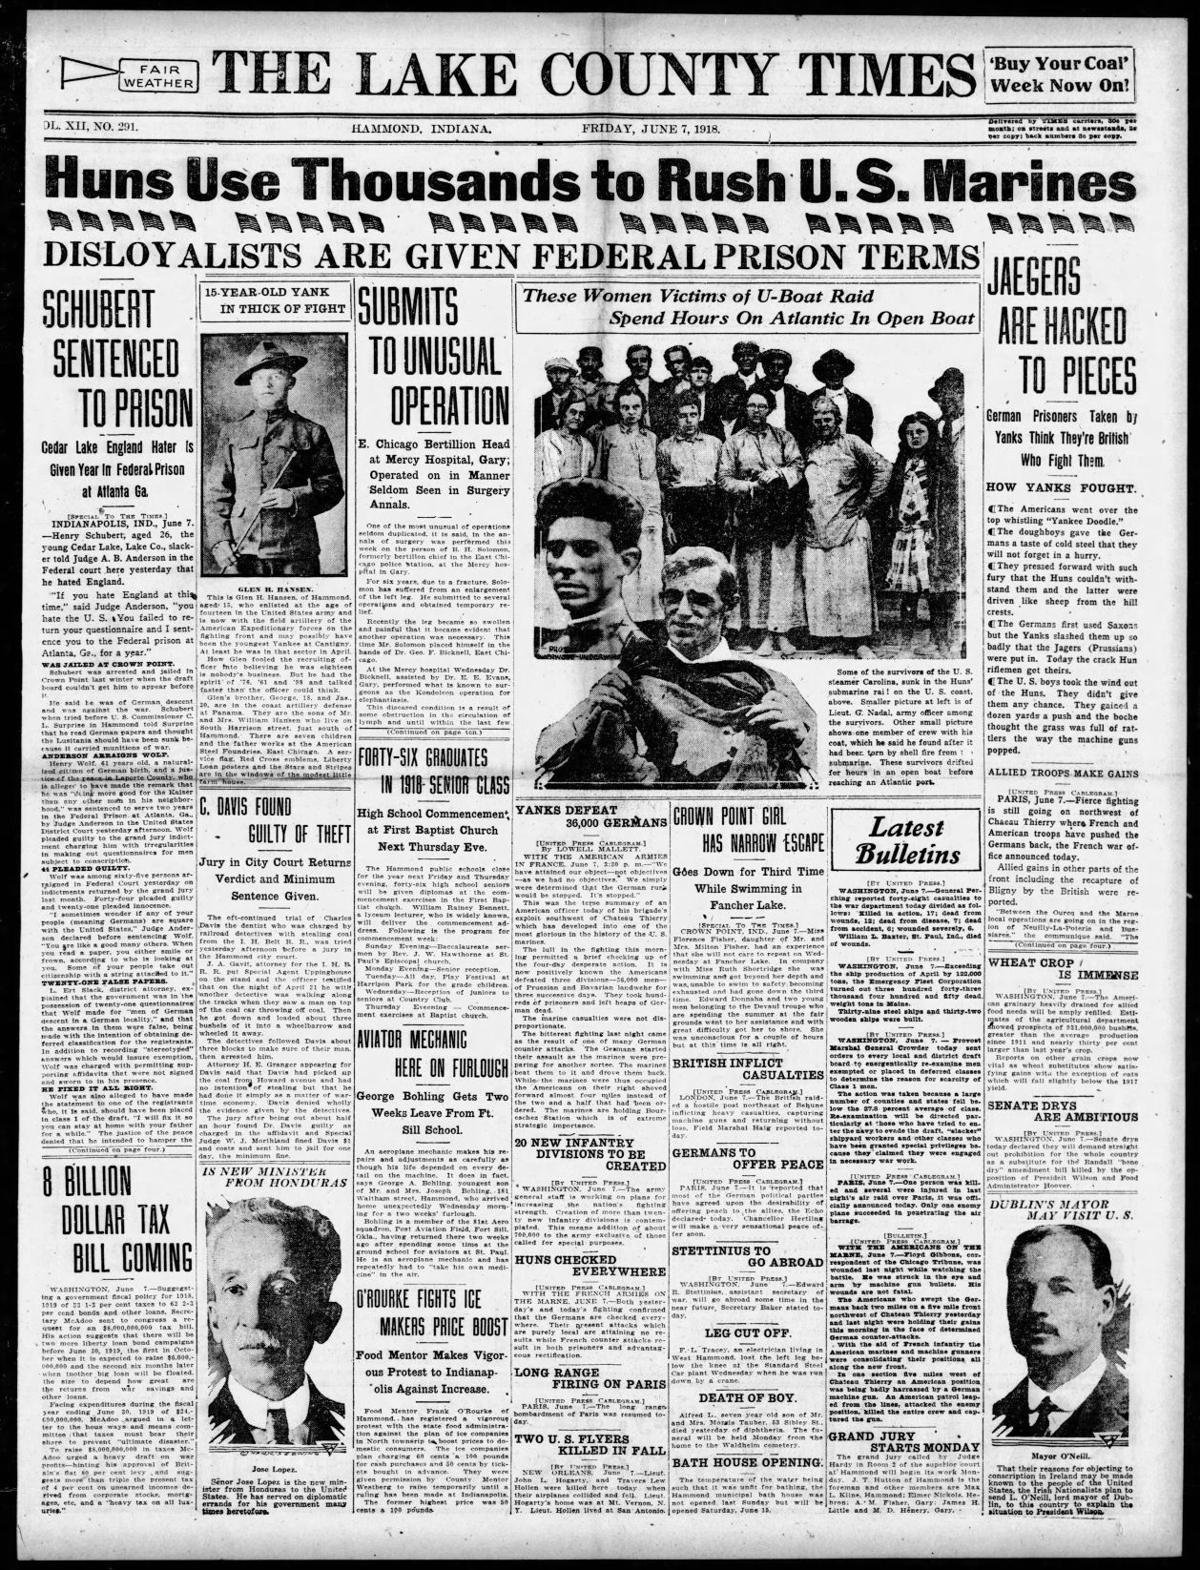 June 7, 1918: Crown Point Girl Has Narrow Escape